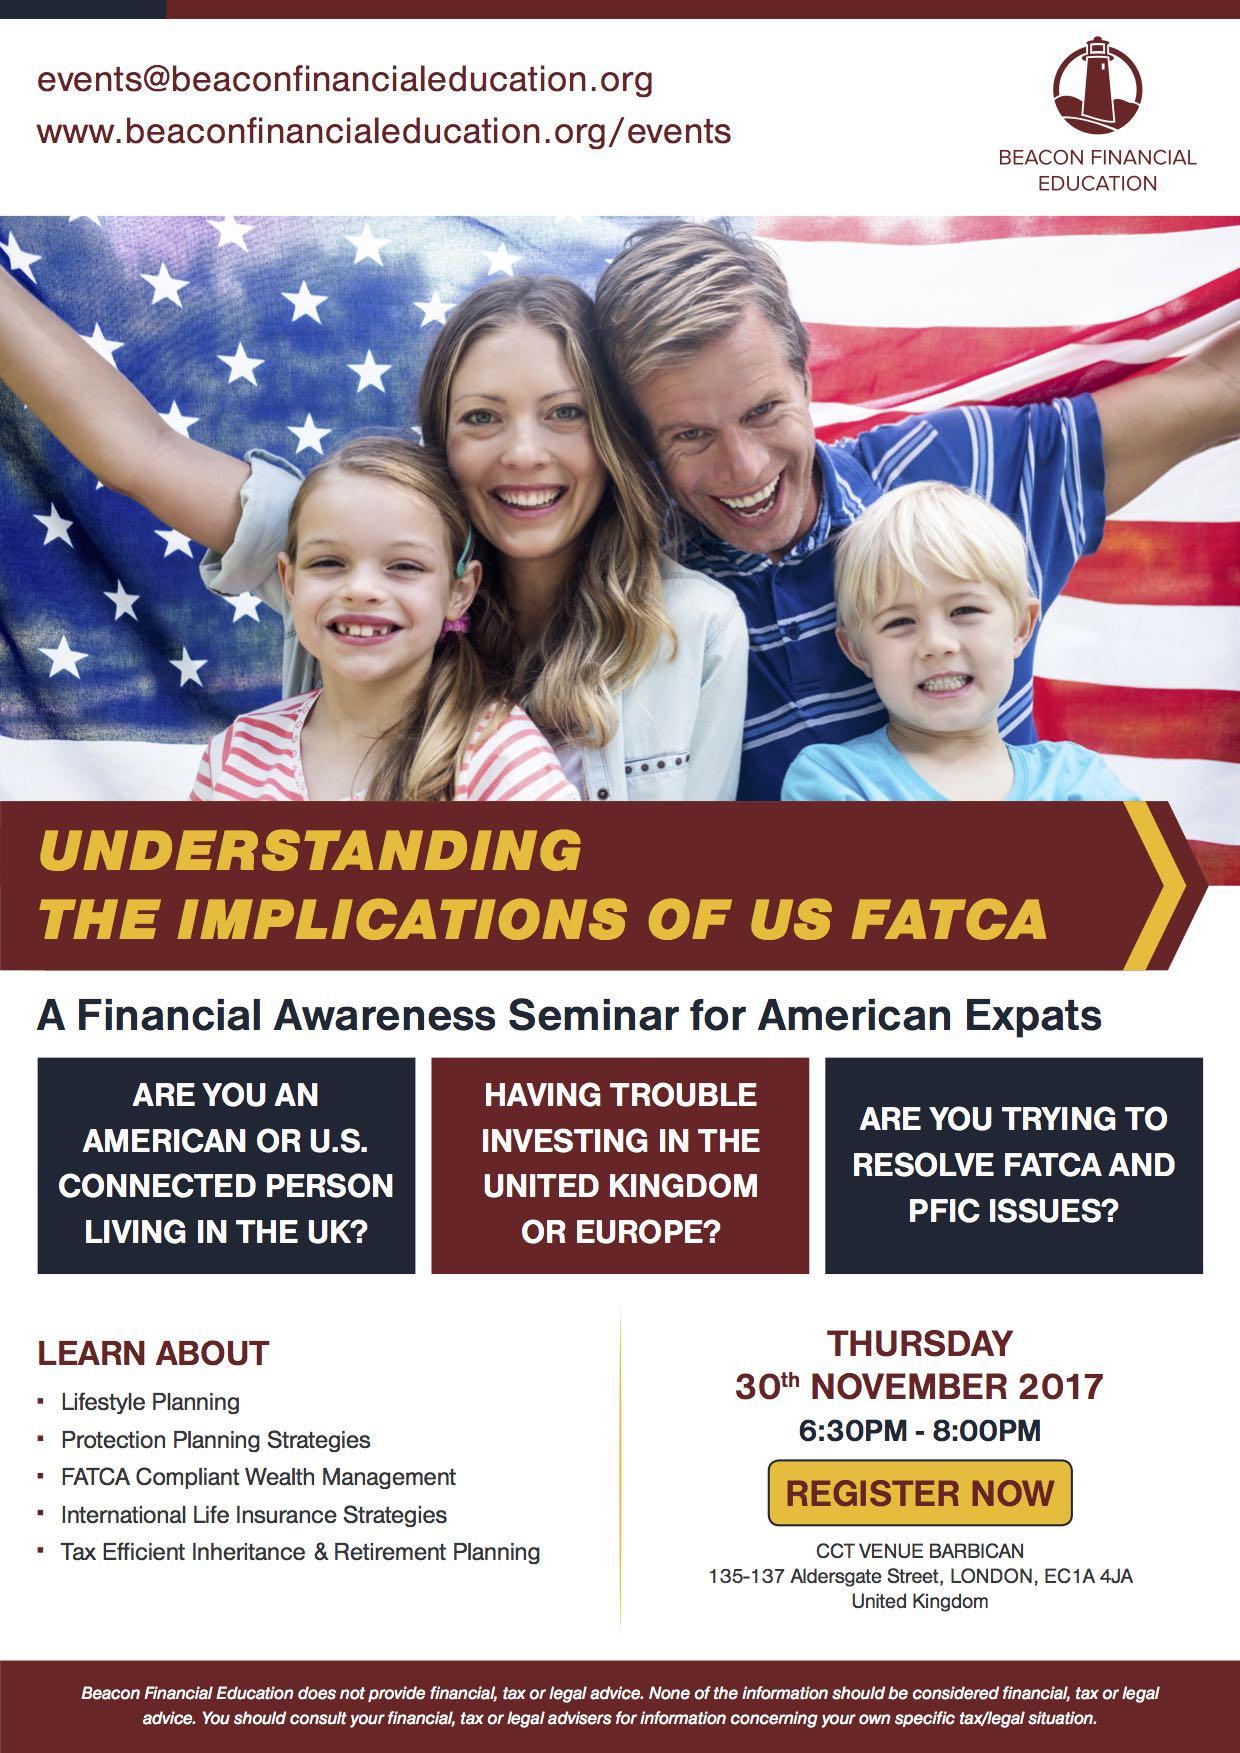 US FATCA seminar London 30 Nov 2017